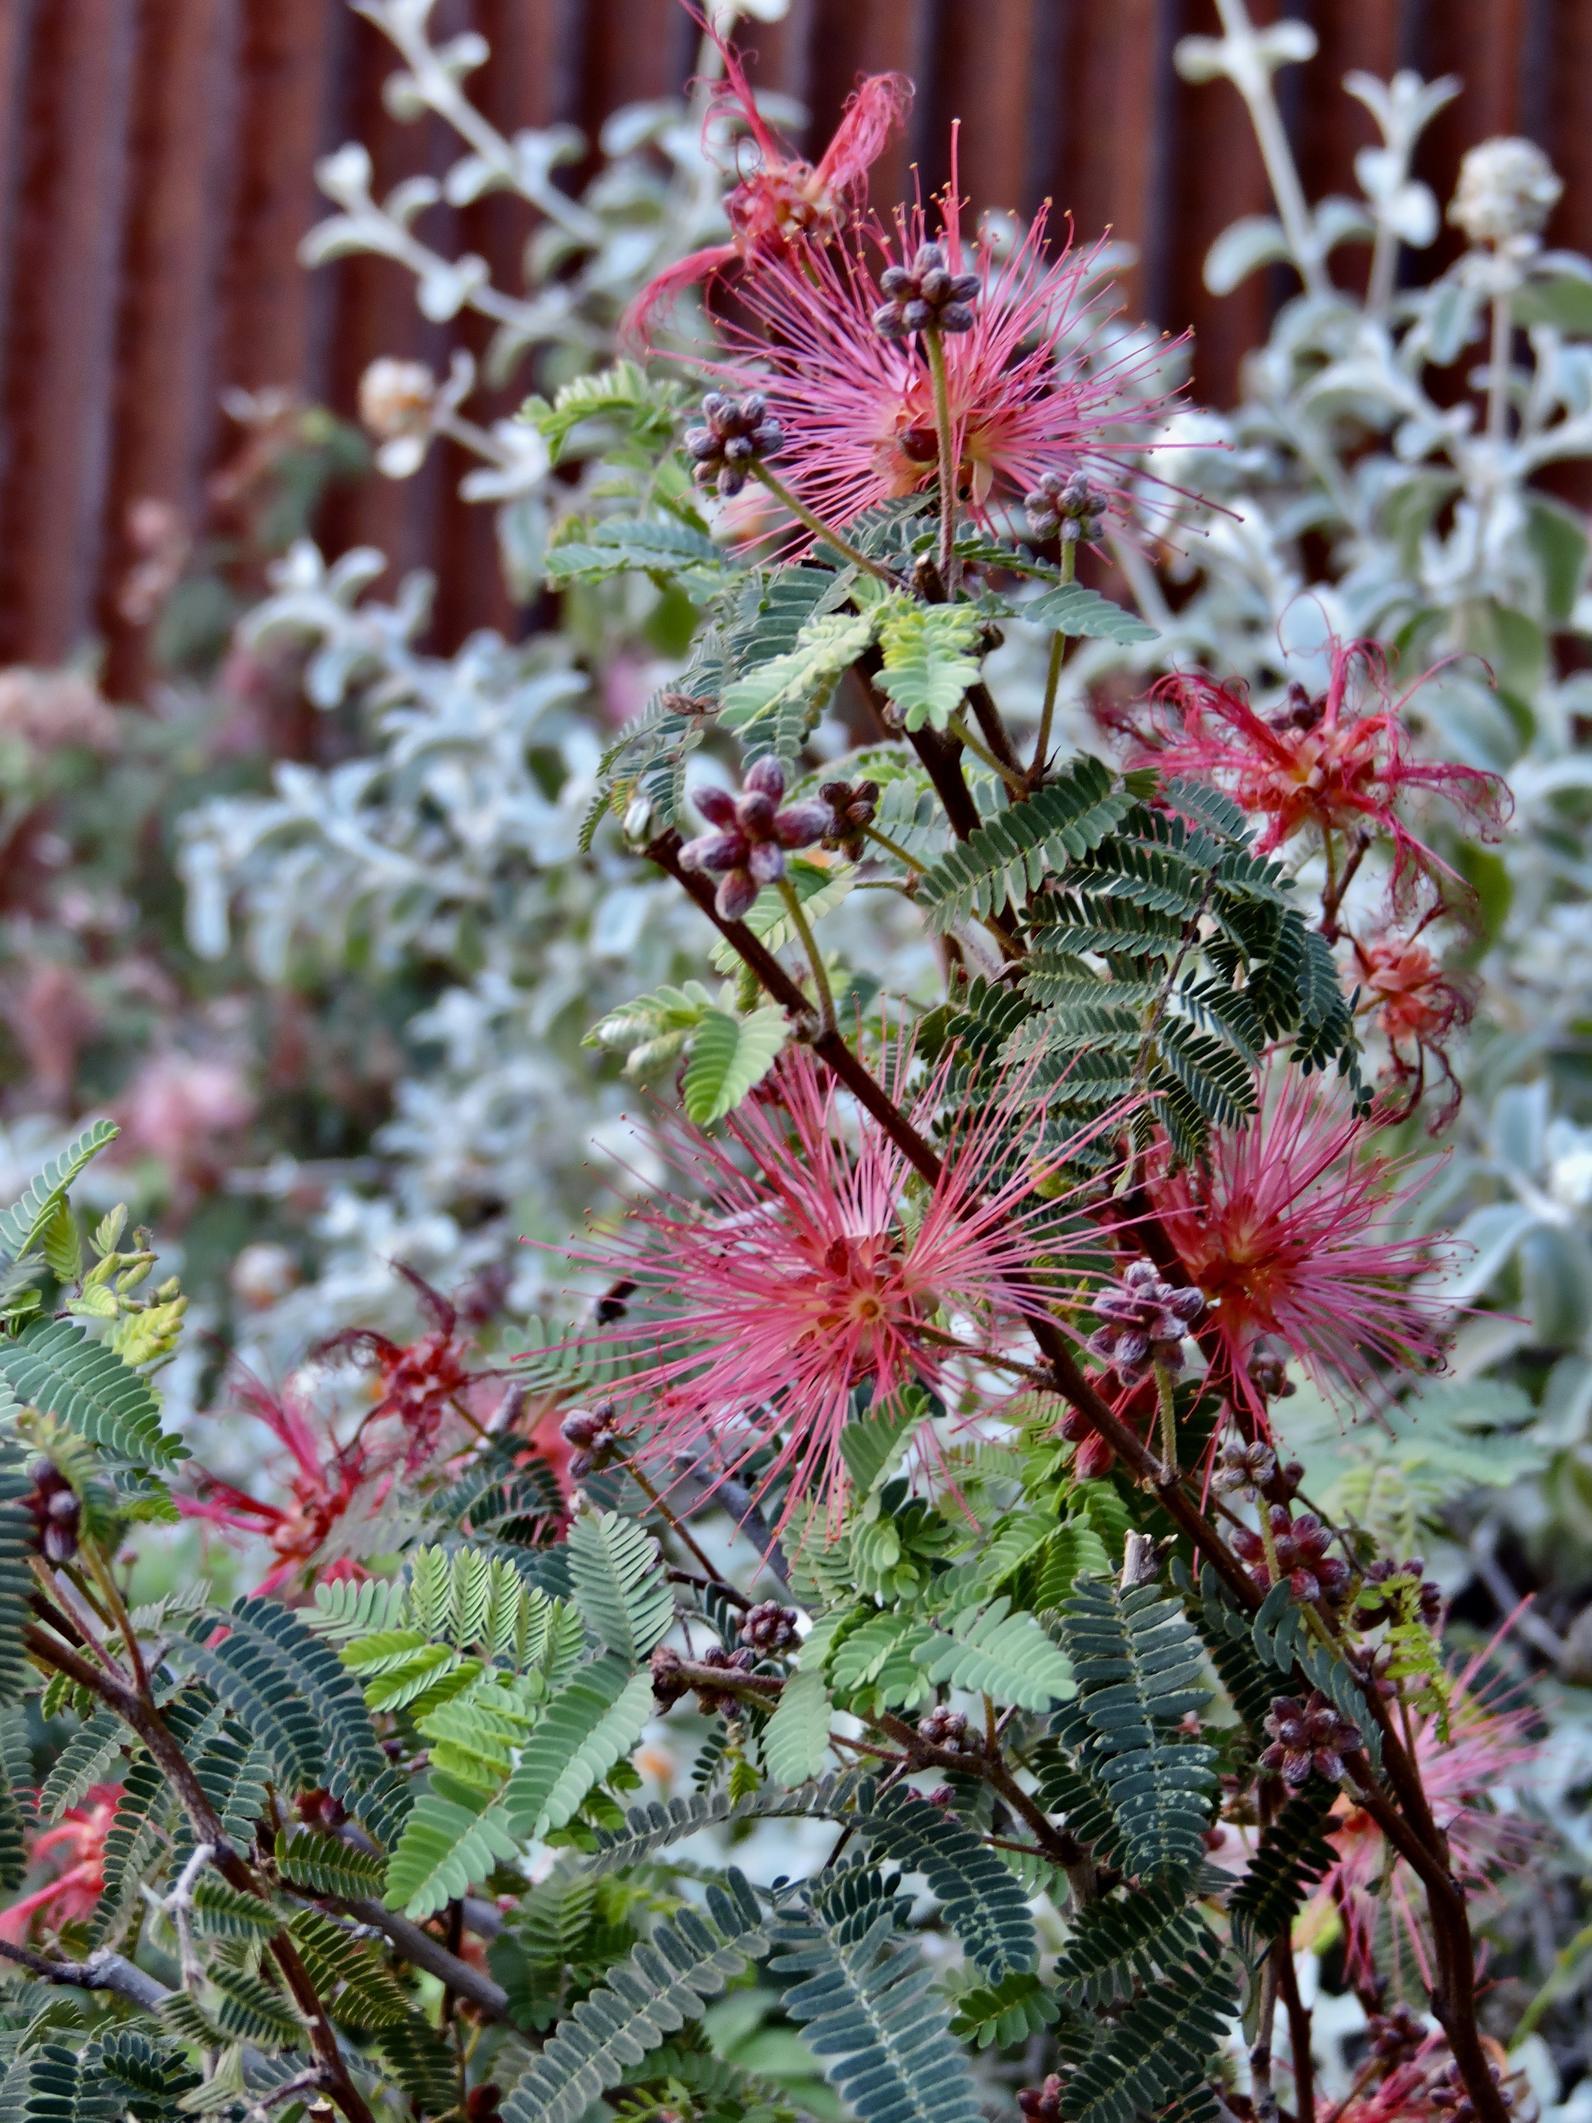 Fairy Duster blooming at the Nina Mason Pulliam Rio Salado Audubon Center